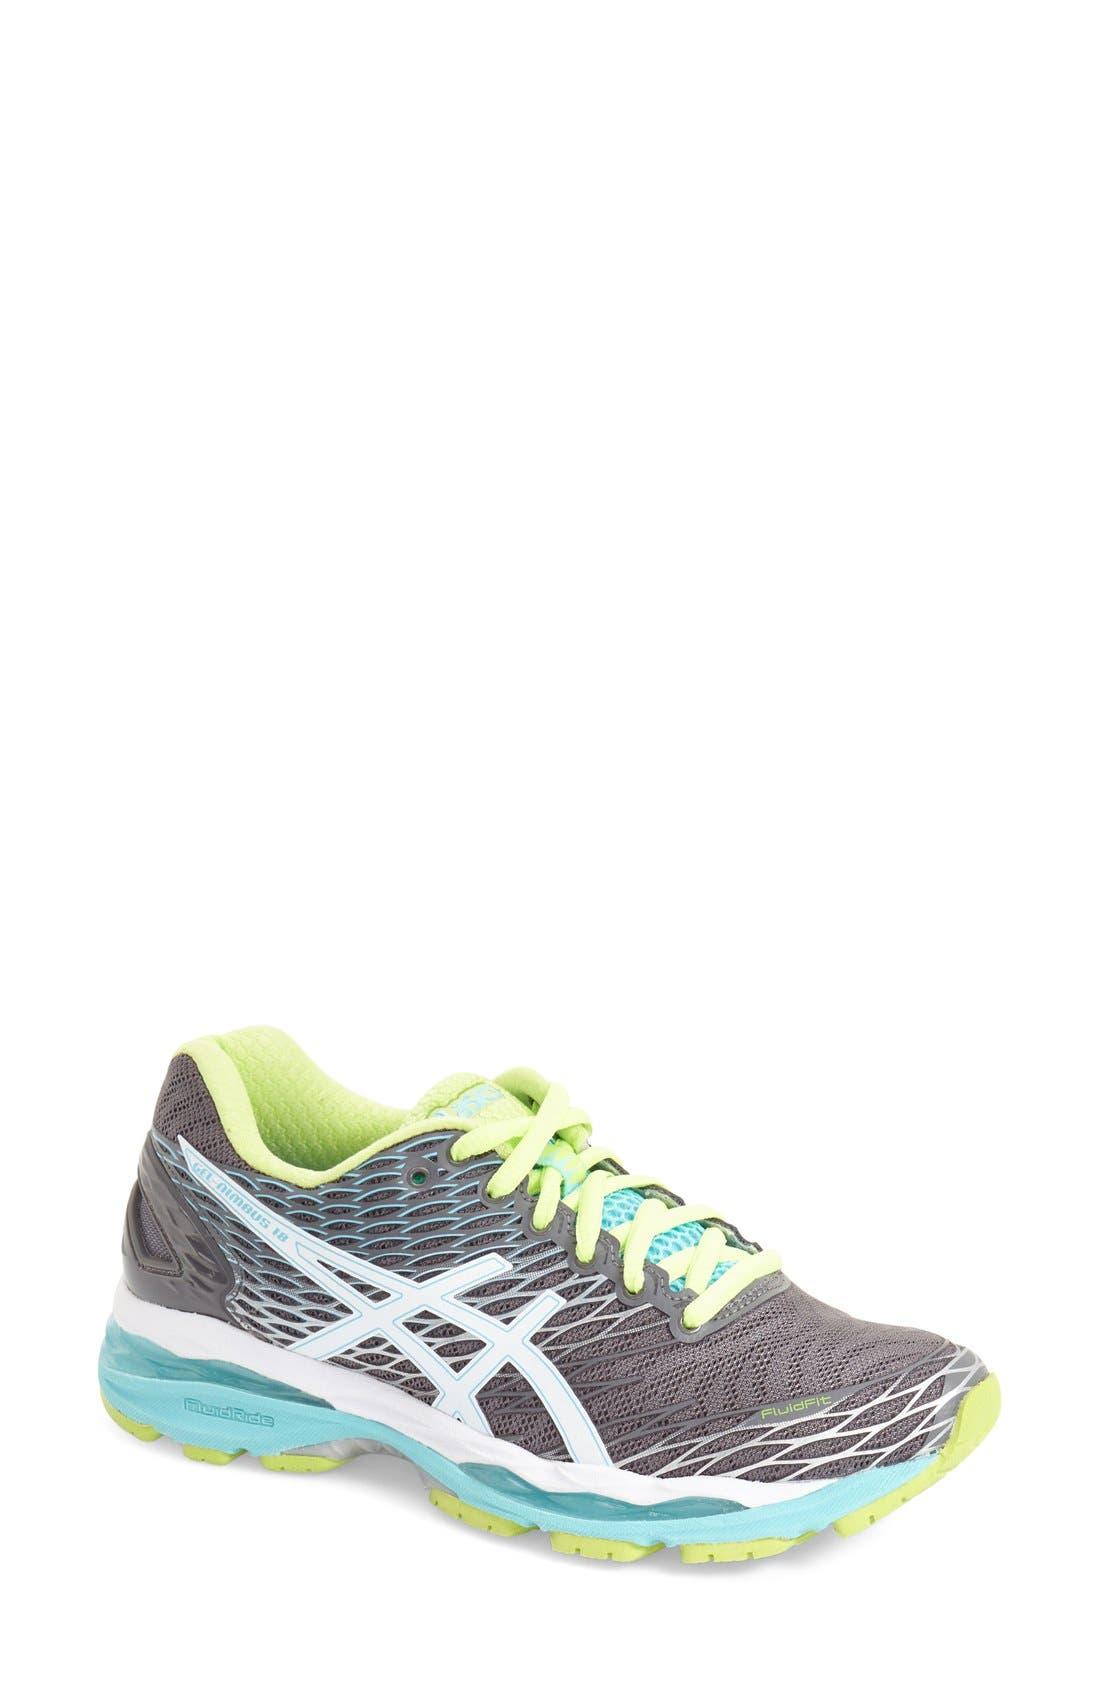 Alternate Image 1 Selected - ASICS® 'GEL-Nimbus 18' Running Shoe (Women)